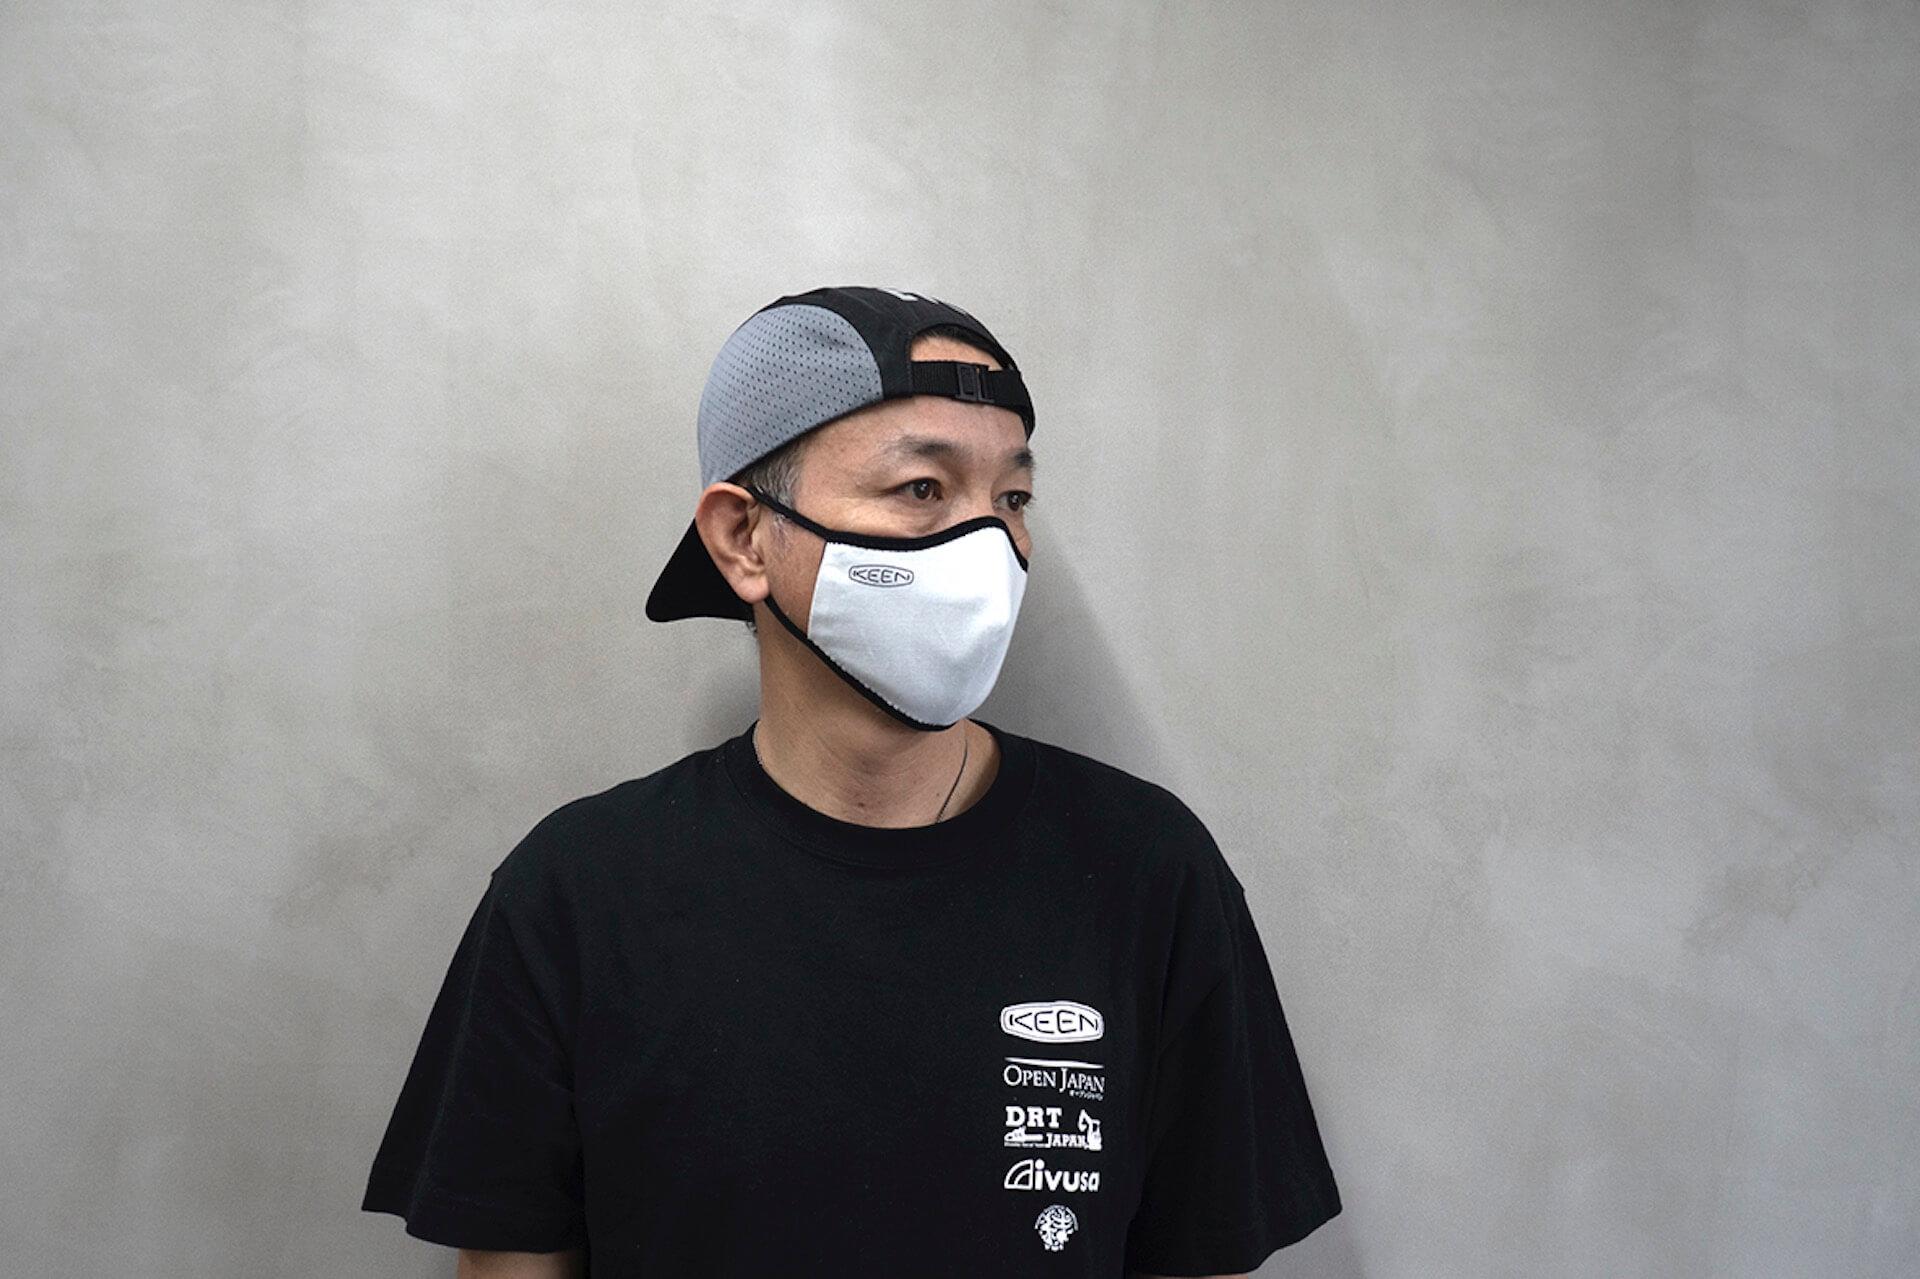 KEENがマスク15万枚を無償提供|タイの自社工場で洗って使えるリバーシブル立体マスクの製造を開始 lf200424_keen_mask_04